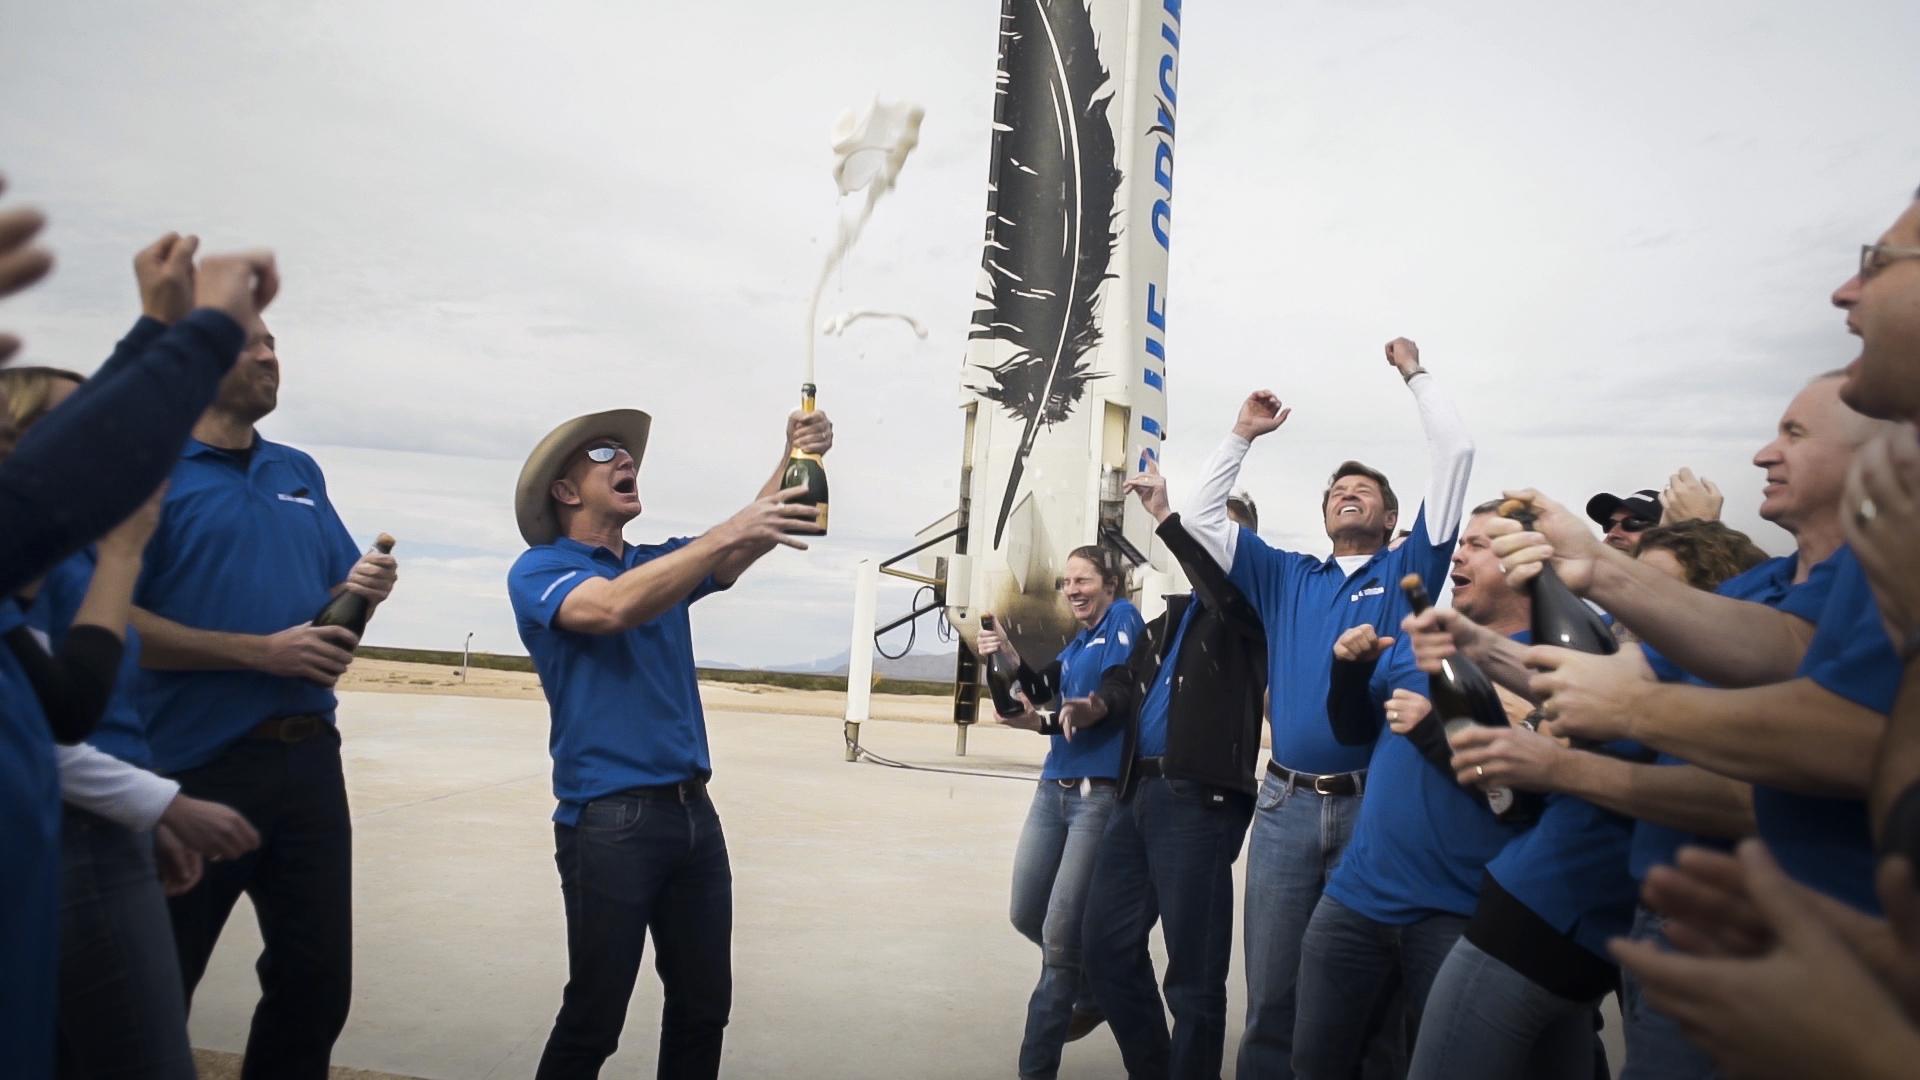 Jeff Bezos pops a bottle of champagne in celebration of a successful Blue Origin rocket launch and landing.